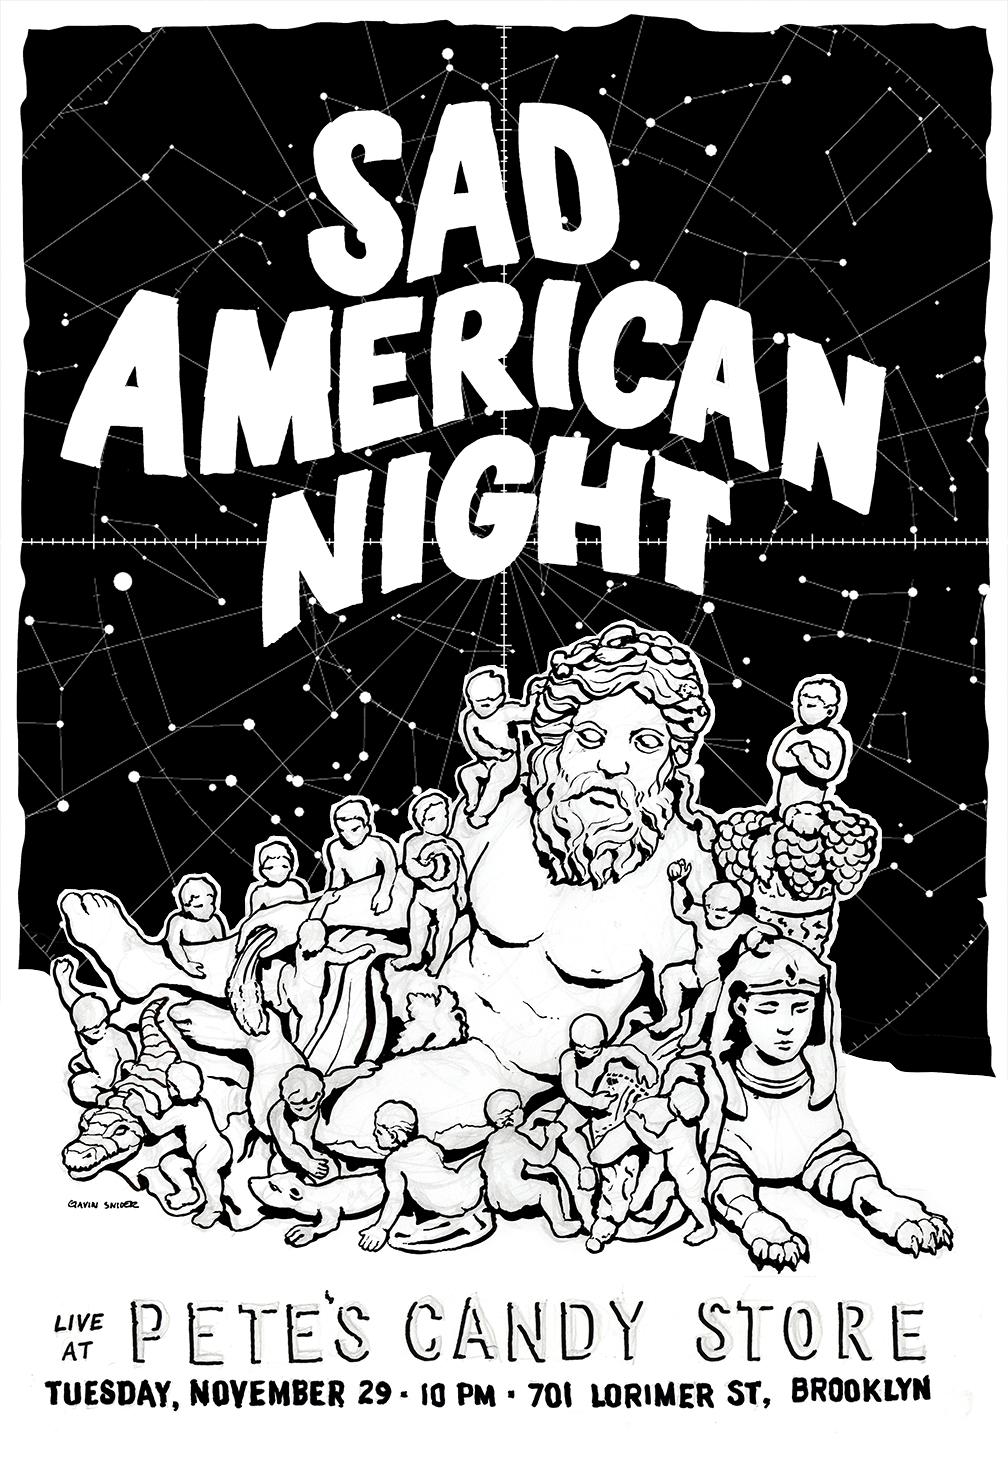 Sad-American-Night.jpg